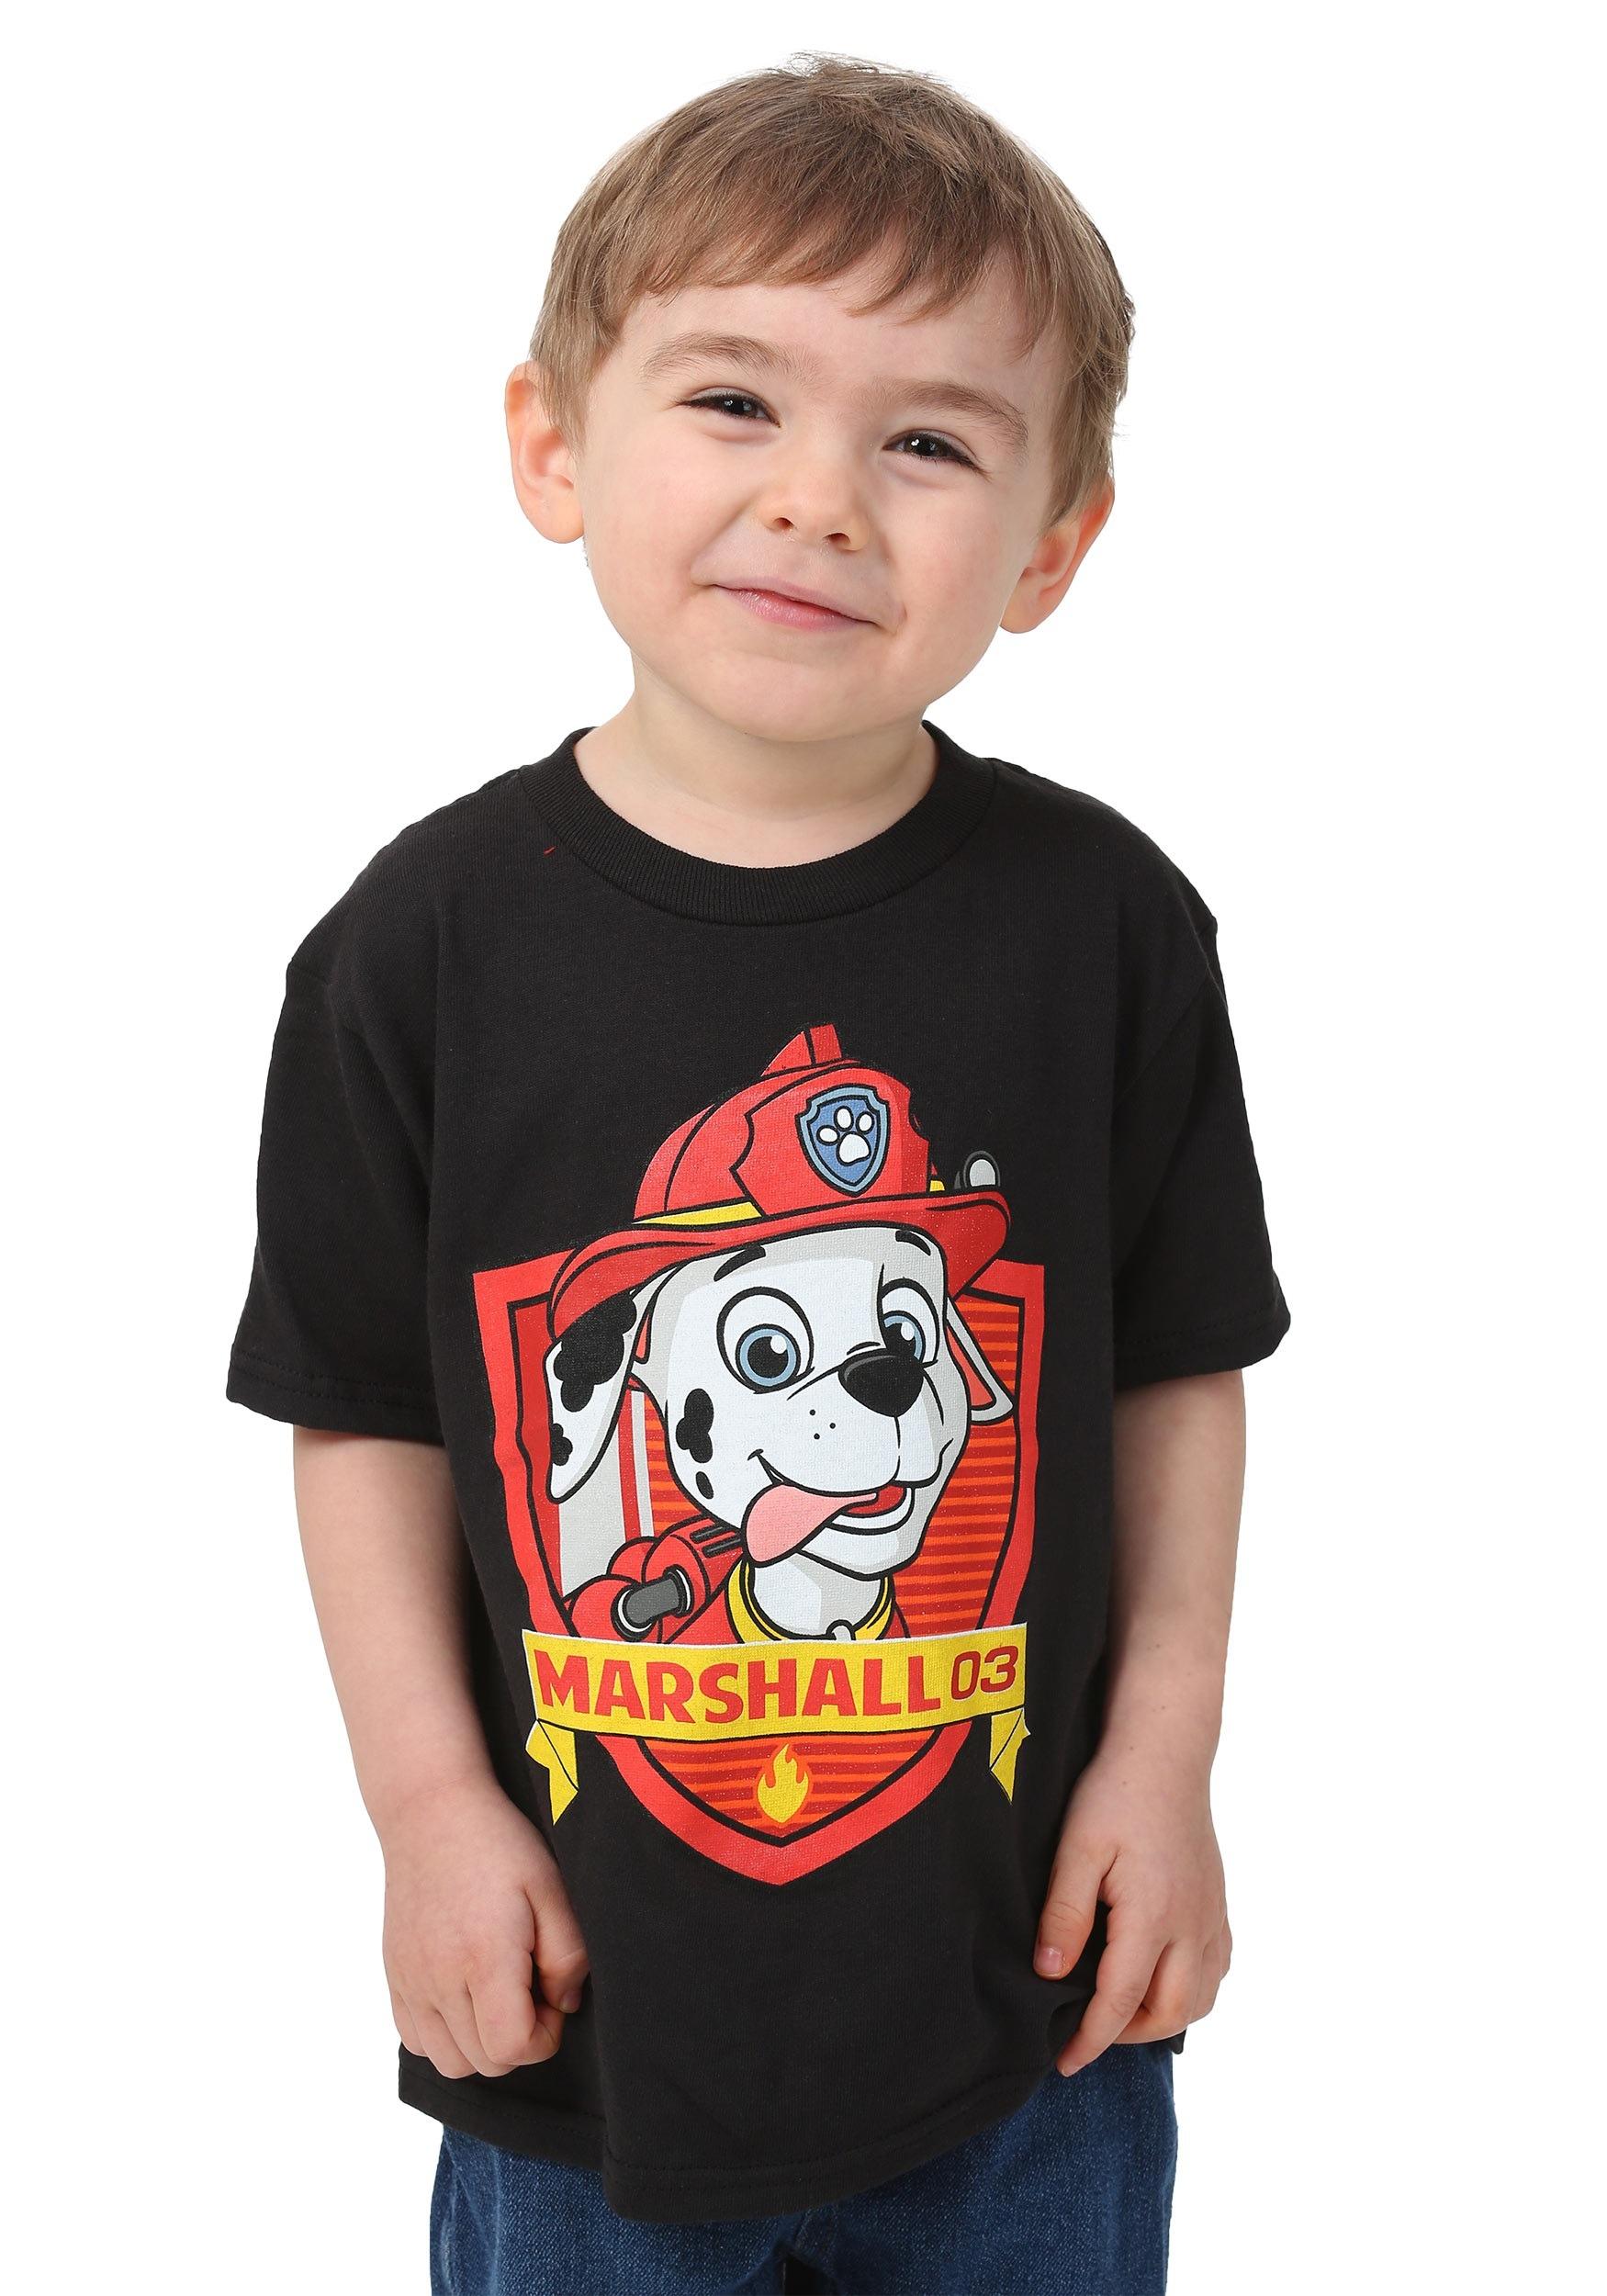 Toddler Boy Long Blonde Hair Surfer: Paw Patrol Marshall Face Toddler Boys